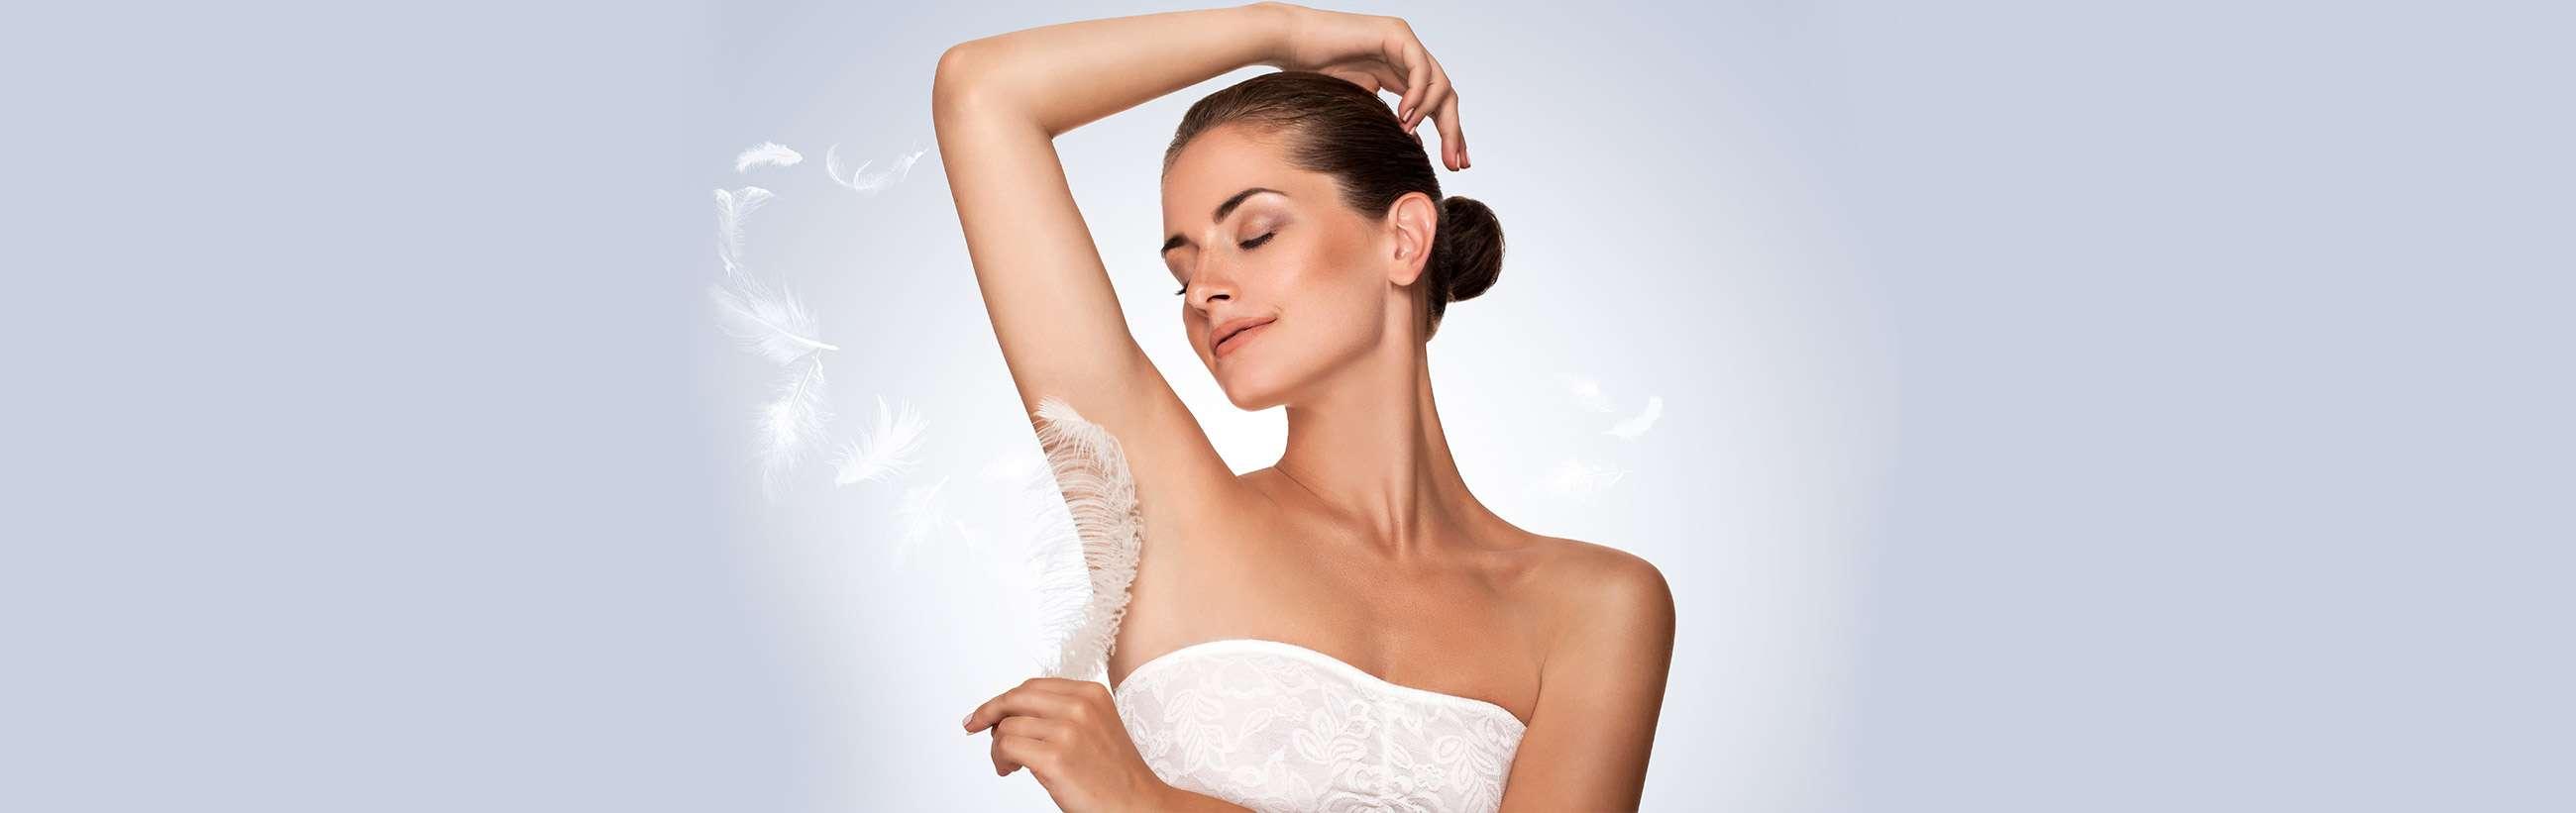 laser-hair-removal-melbourne